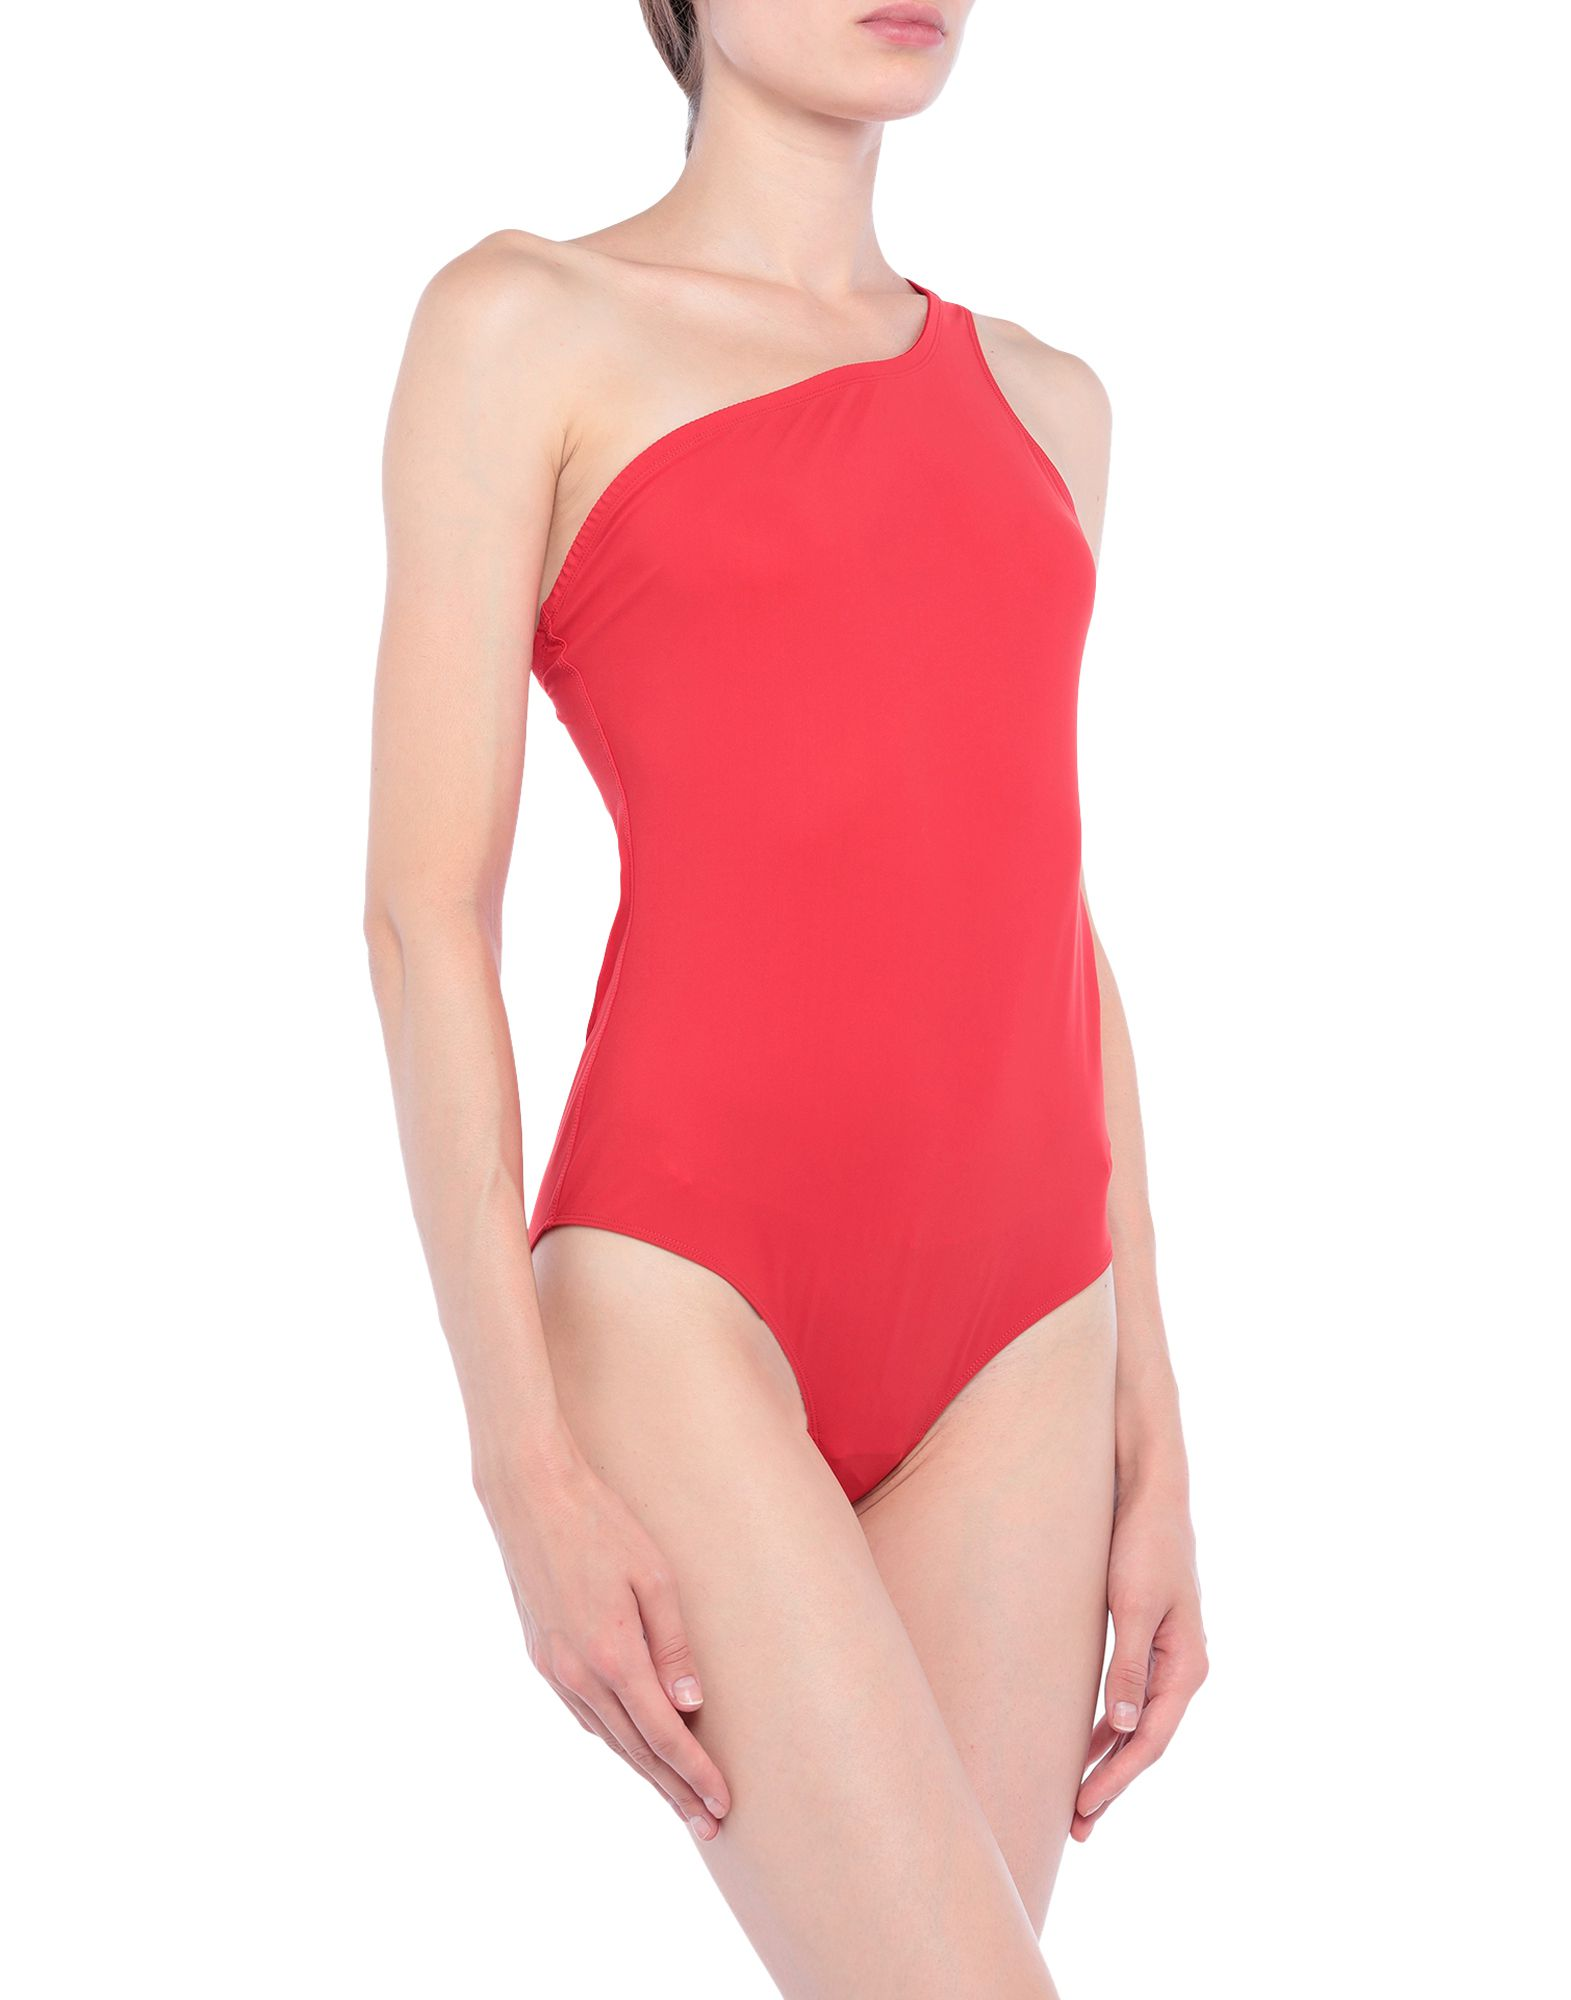 ISABEL MARANT One-piece swimsuits - Item 47253952